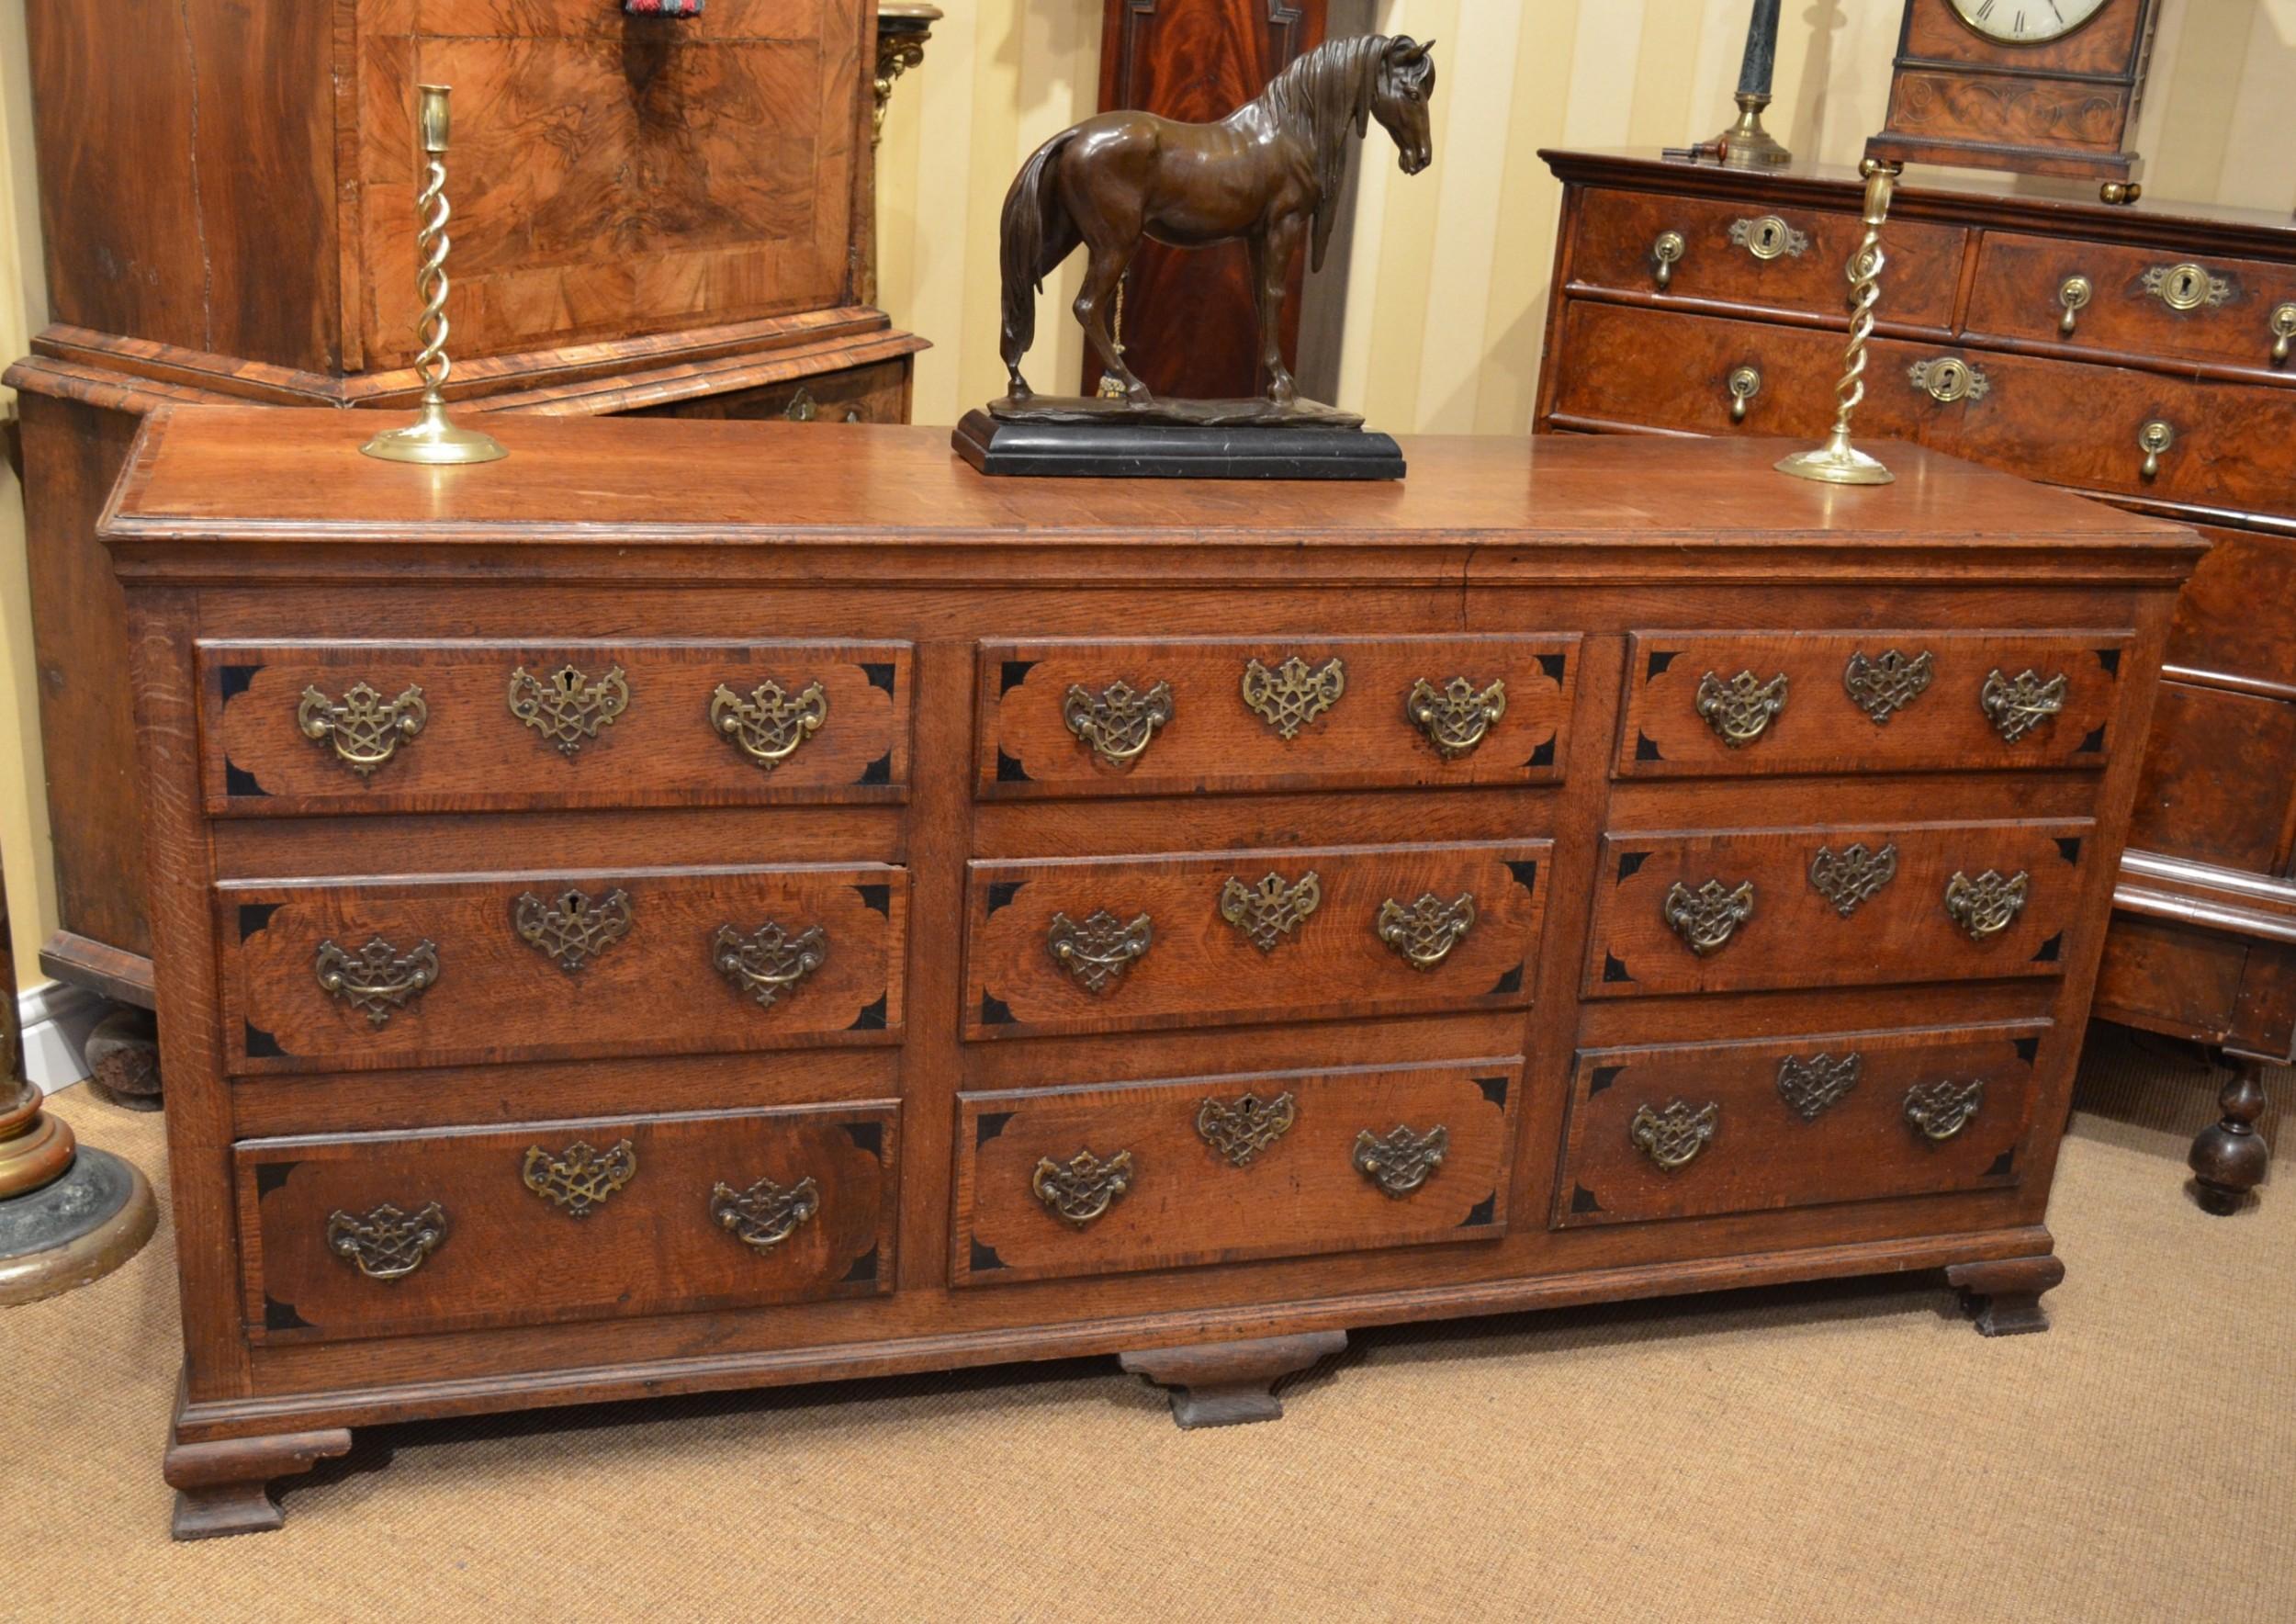 a very impressive oak dresser base with nine drawers